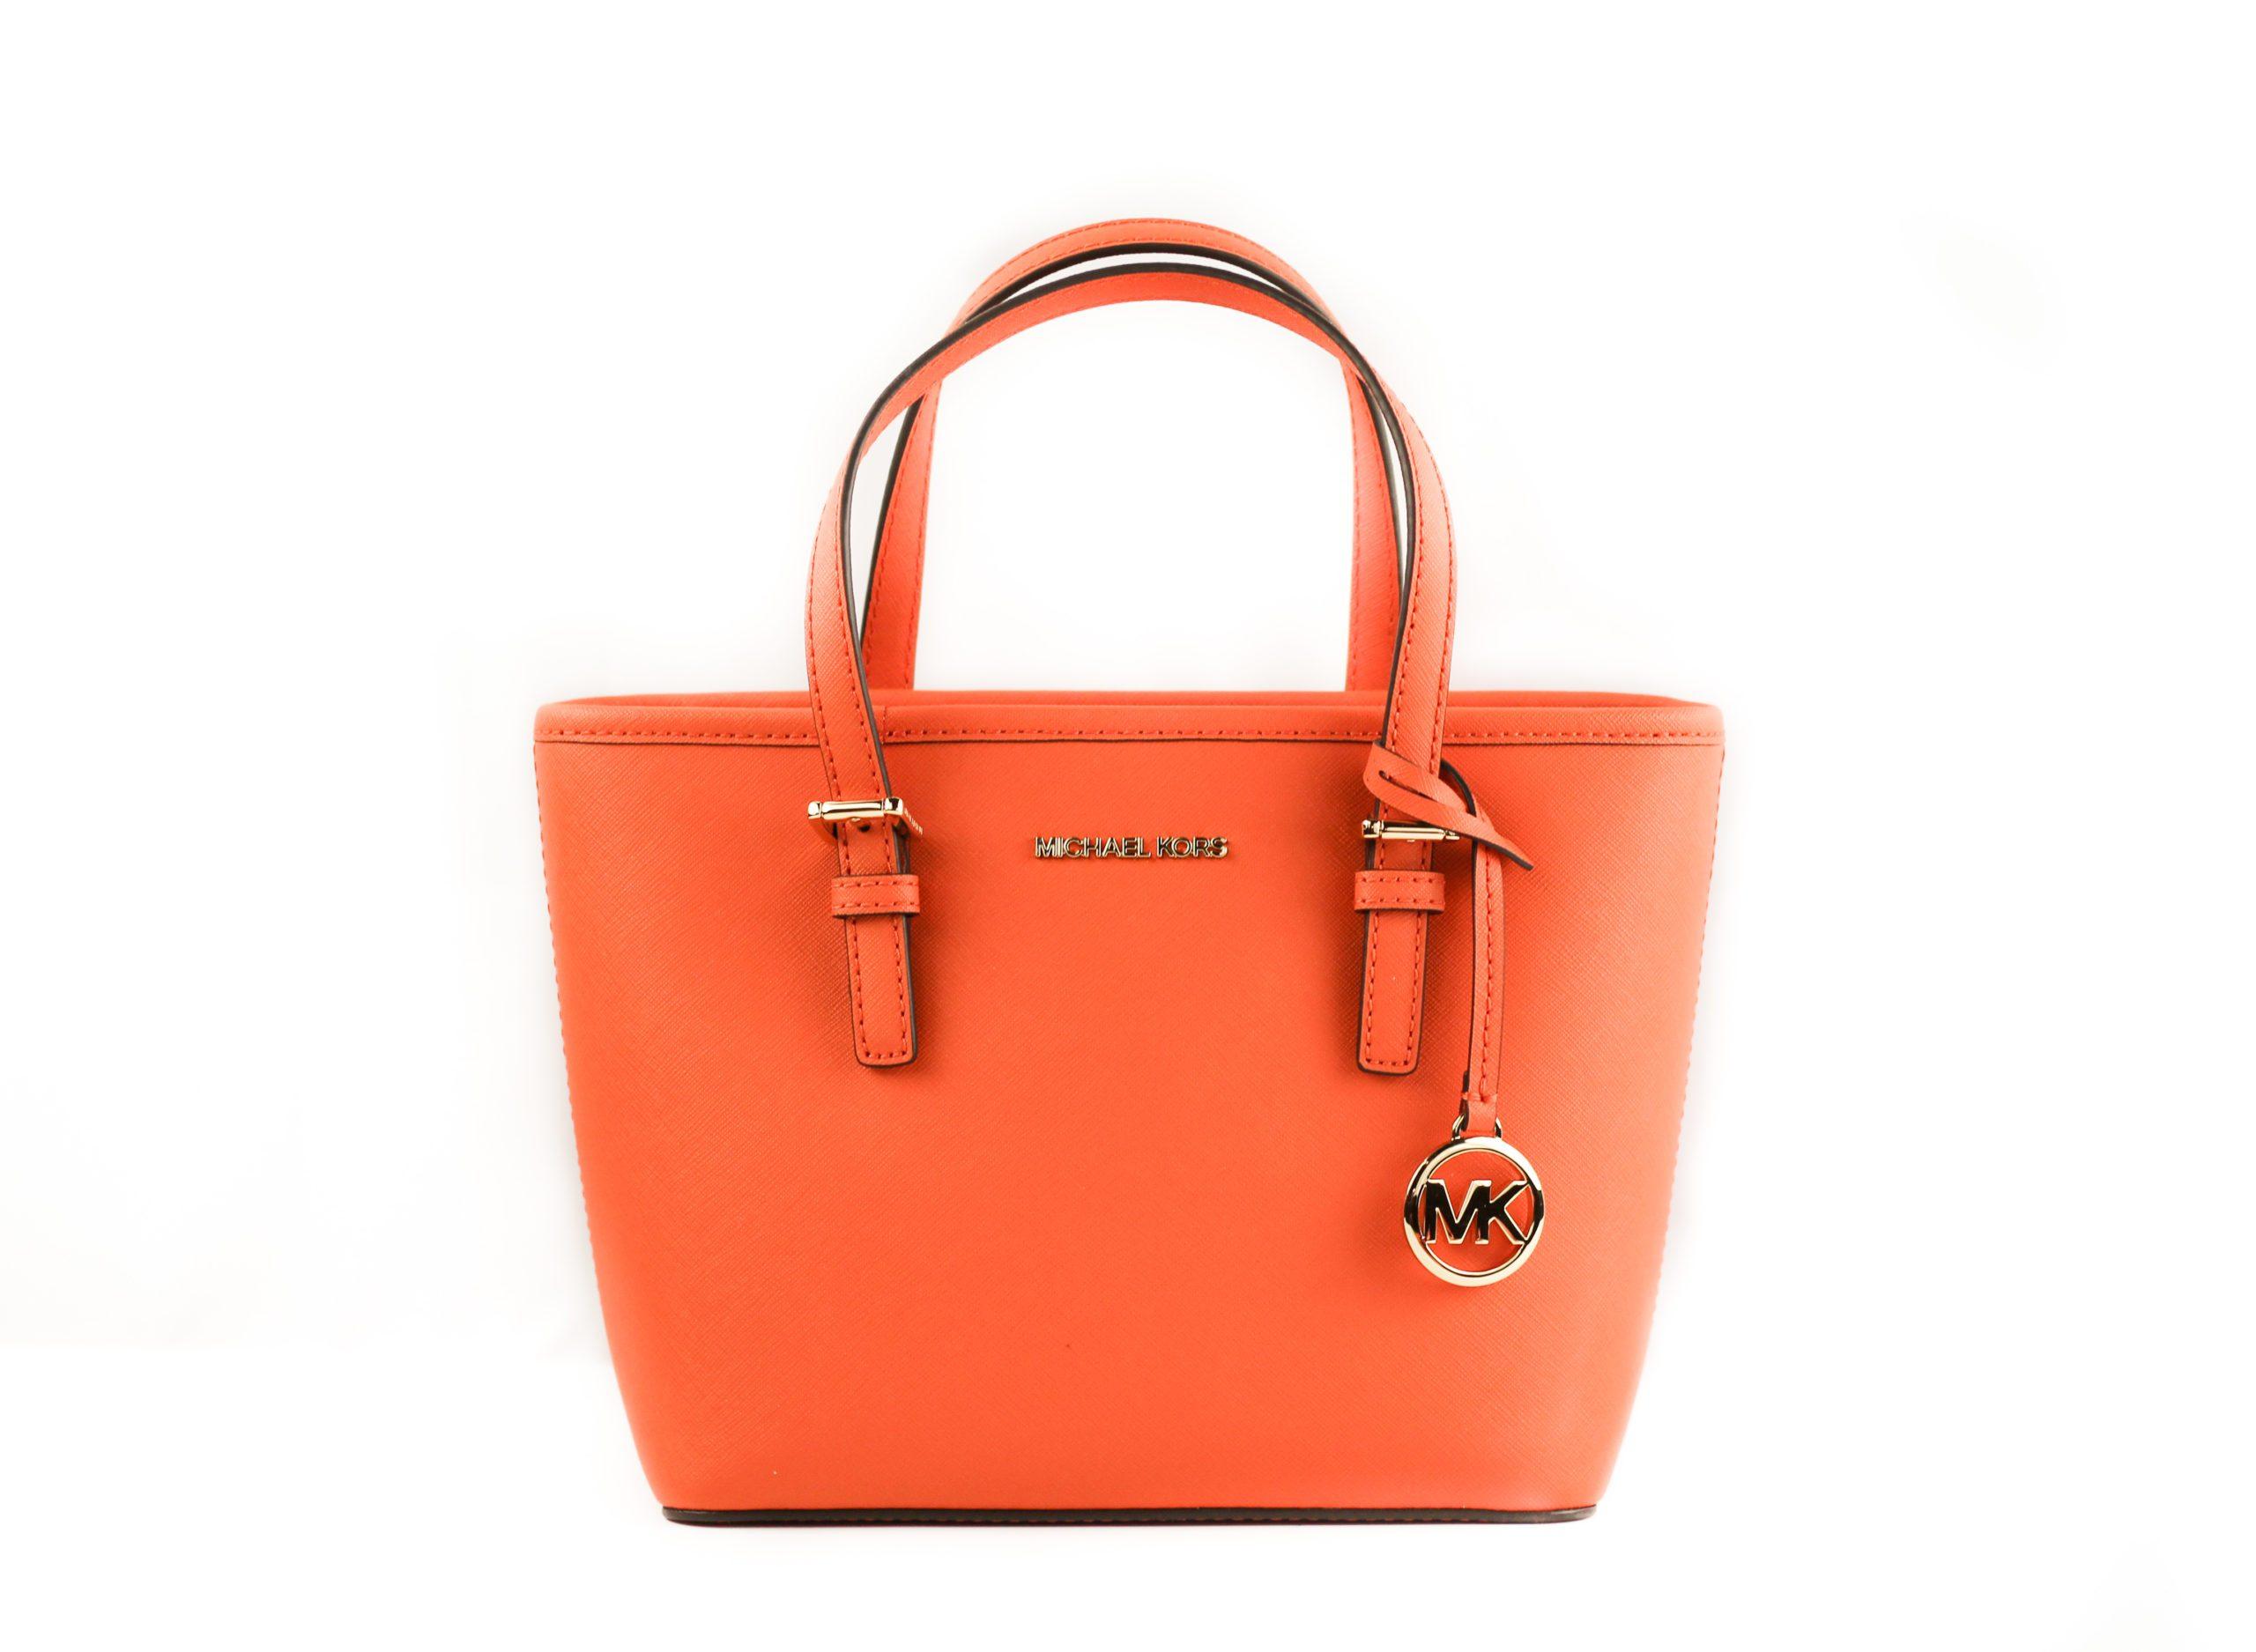 Michael Kors Women's Jet Set Tote Bag Orange 59531